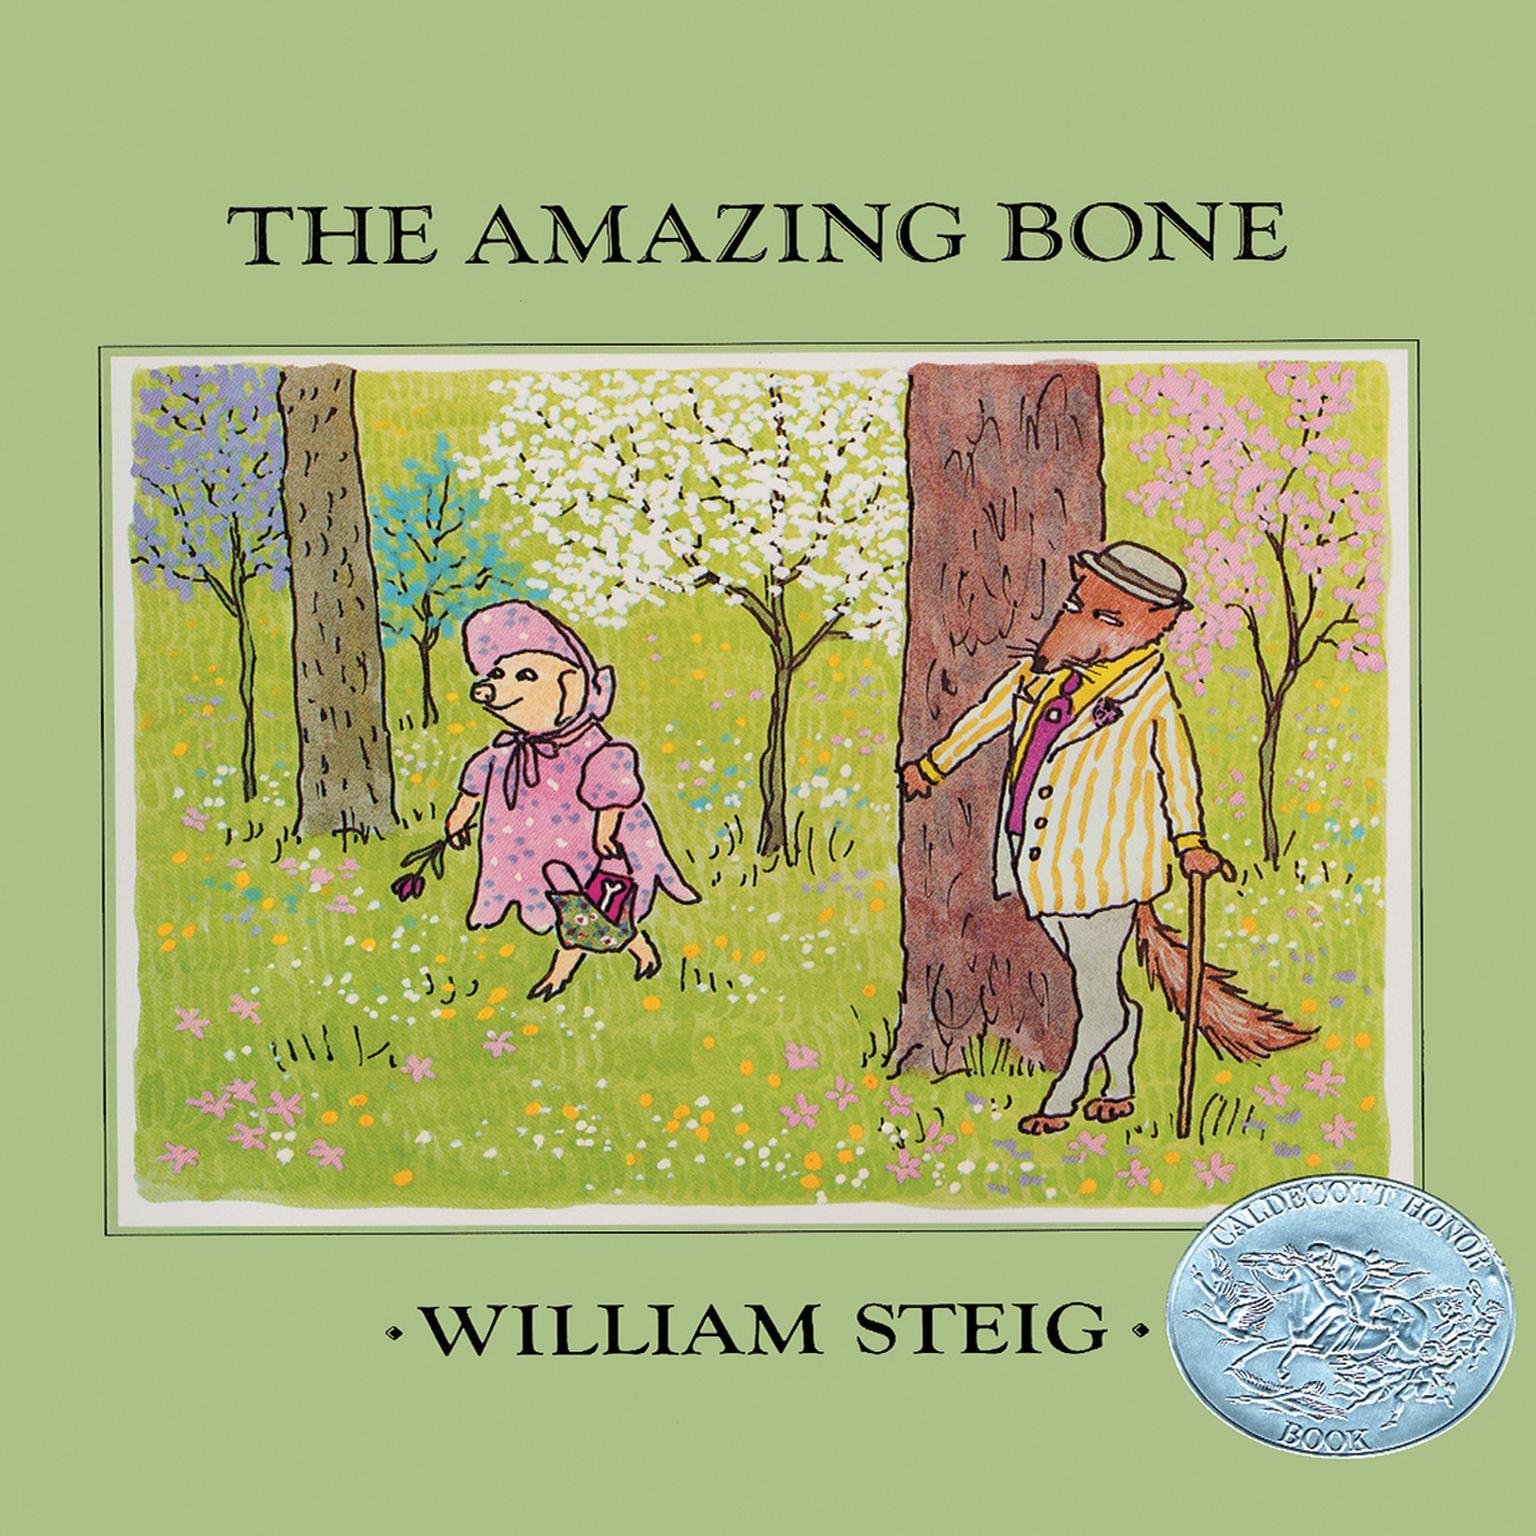 The Amazing Bone Audiobook, by William Steig